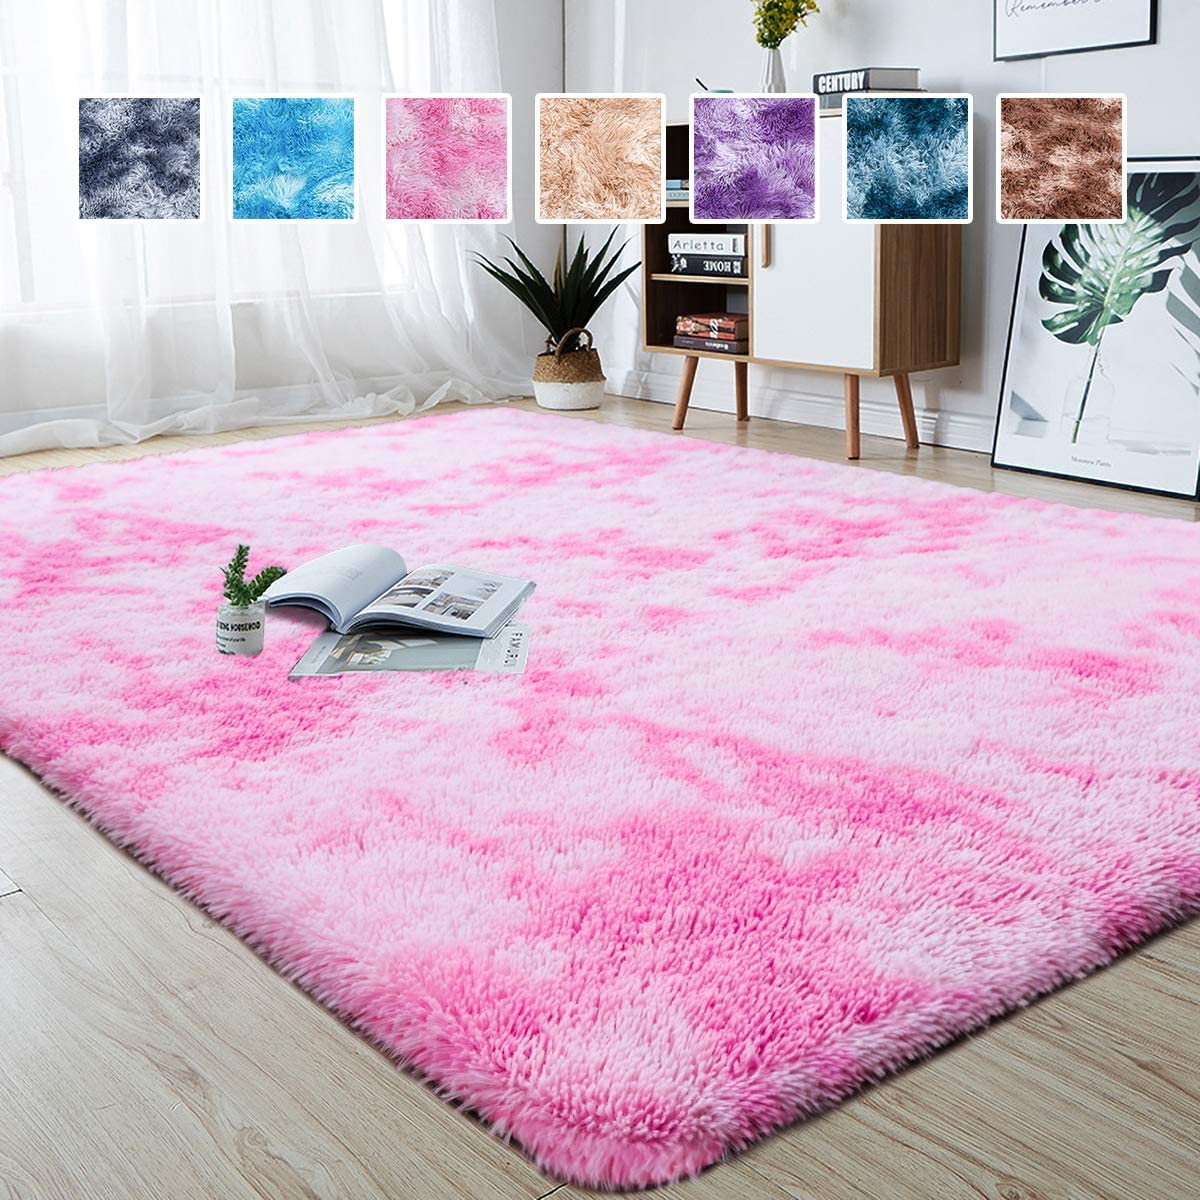 junovo Modern Abstract Shaggy Area Rugs Fluffy Soft Bedroom Rug for Kids Nursery Girls Boys Ultra Comfy Shag Fur Carpets Nursery Room Living Room Furry Decor Rugs, 4 ft x 6 ft, Pink